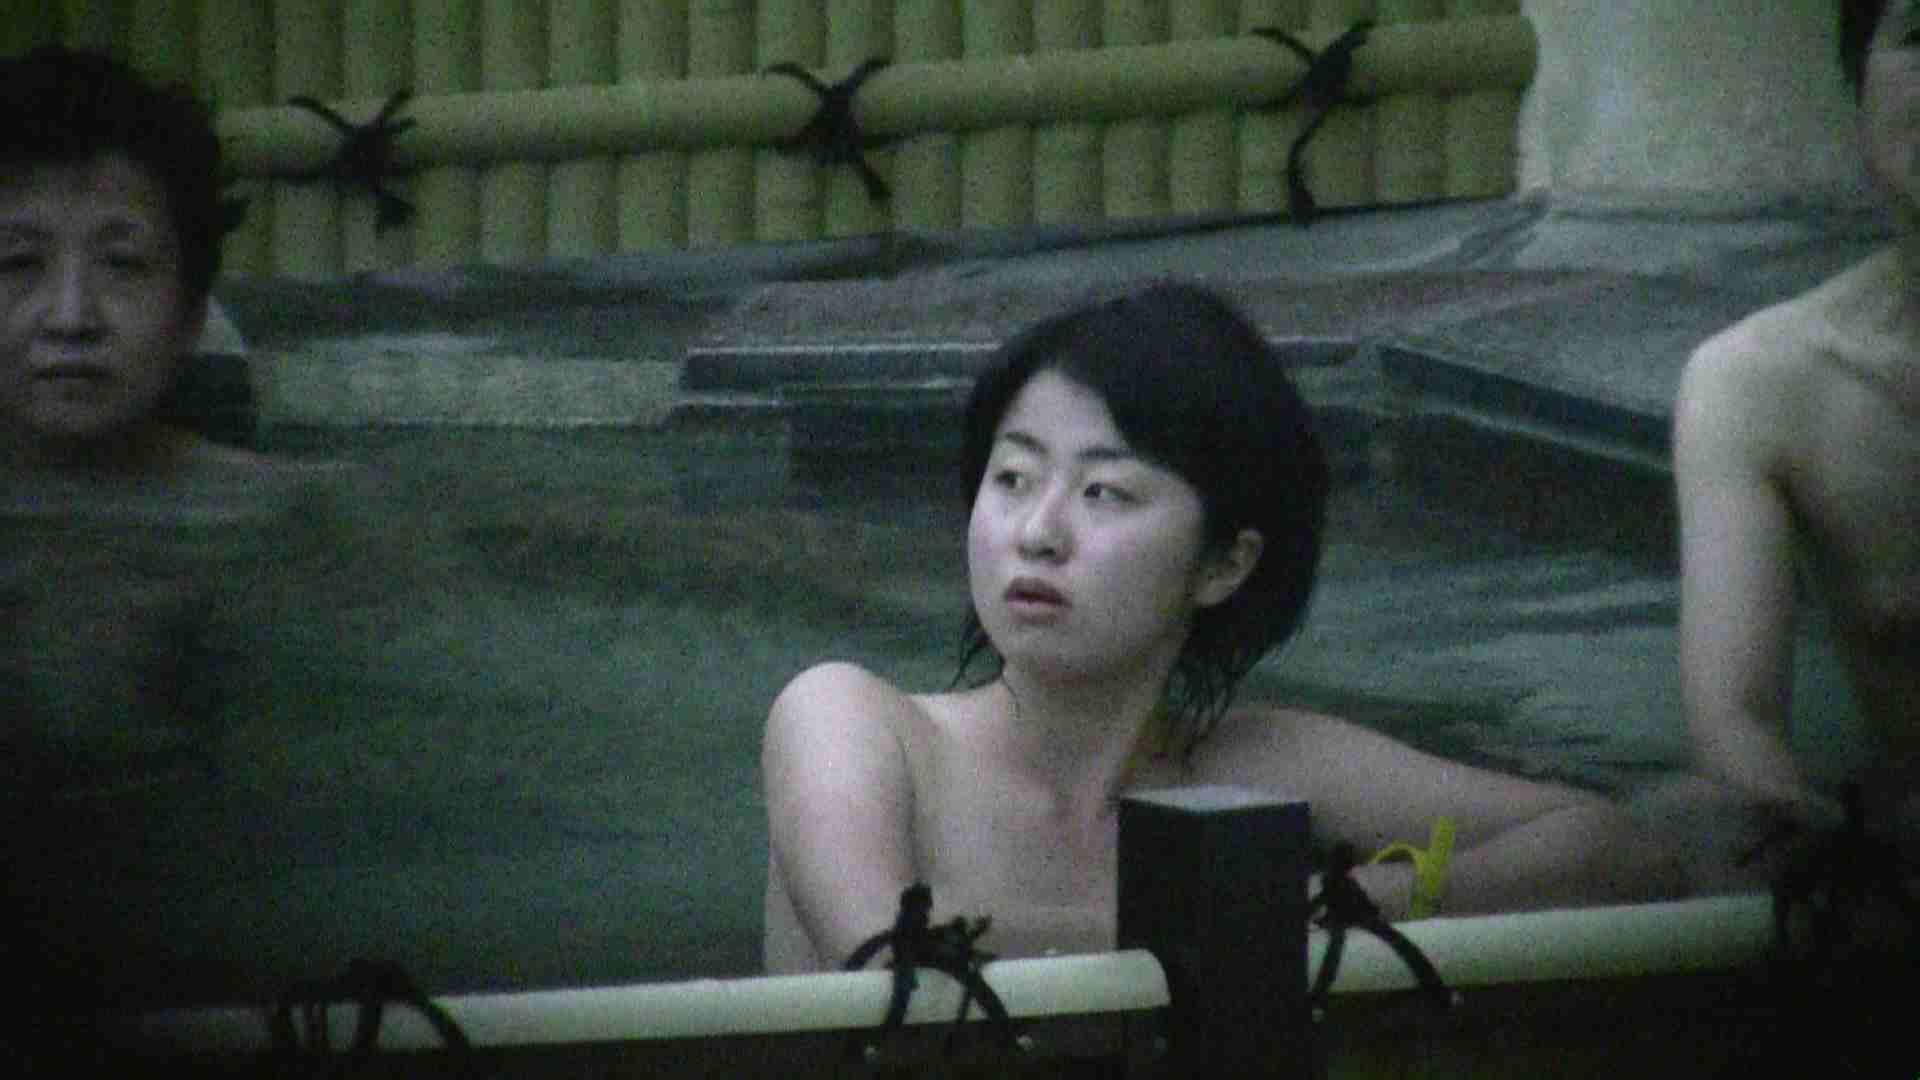 Aquaな露天風呂Vol.112 0 | 0  68連発 37